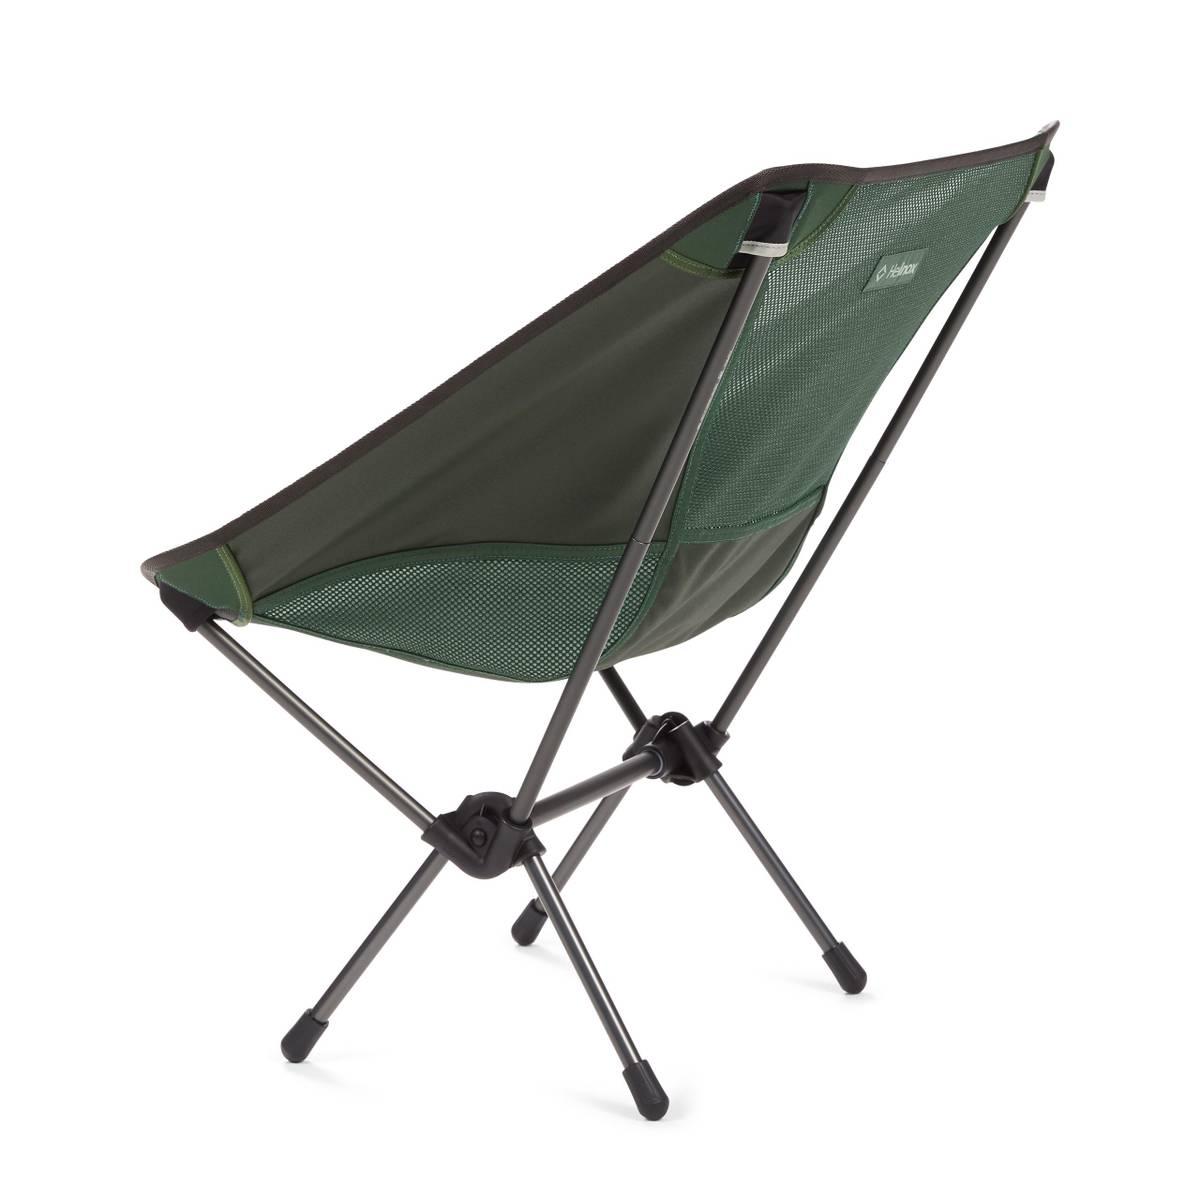 Helinox Chair One Forest Green/Steel Grey